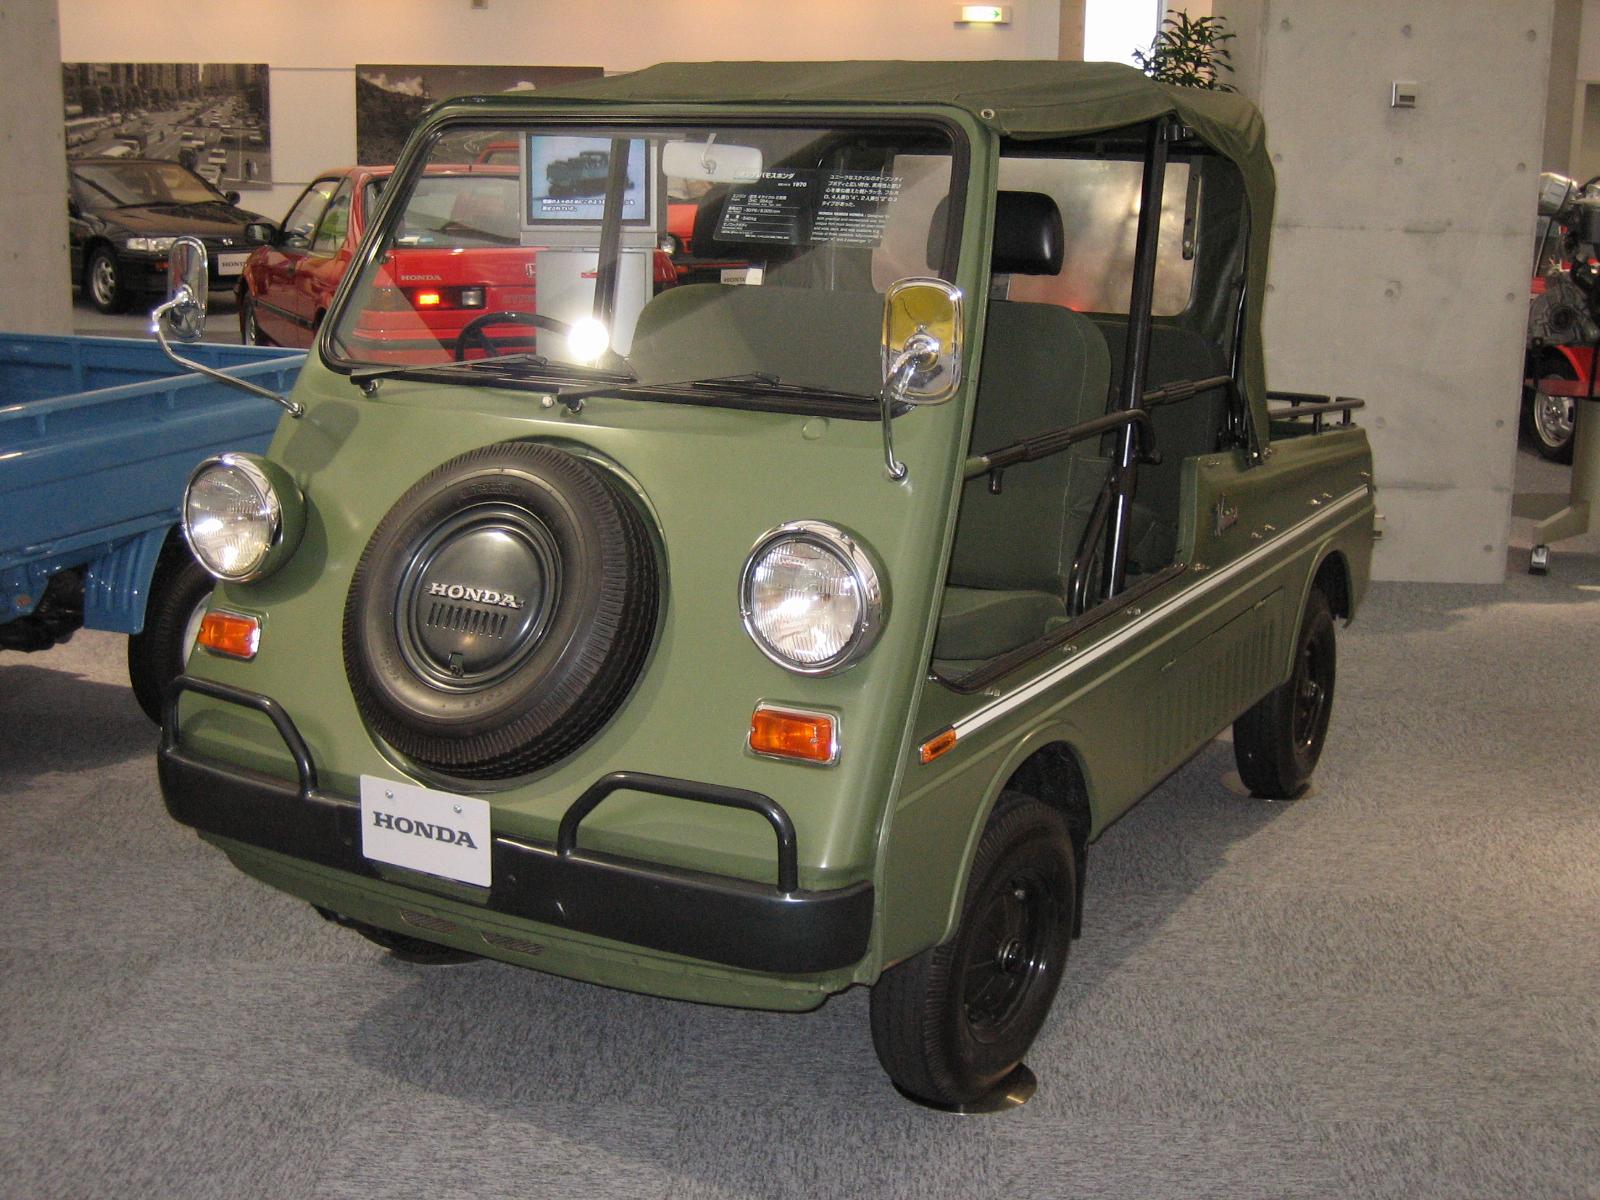 Honda Vamos - Tractor